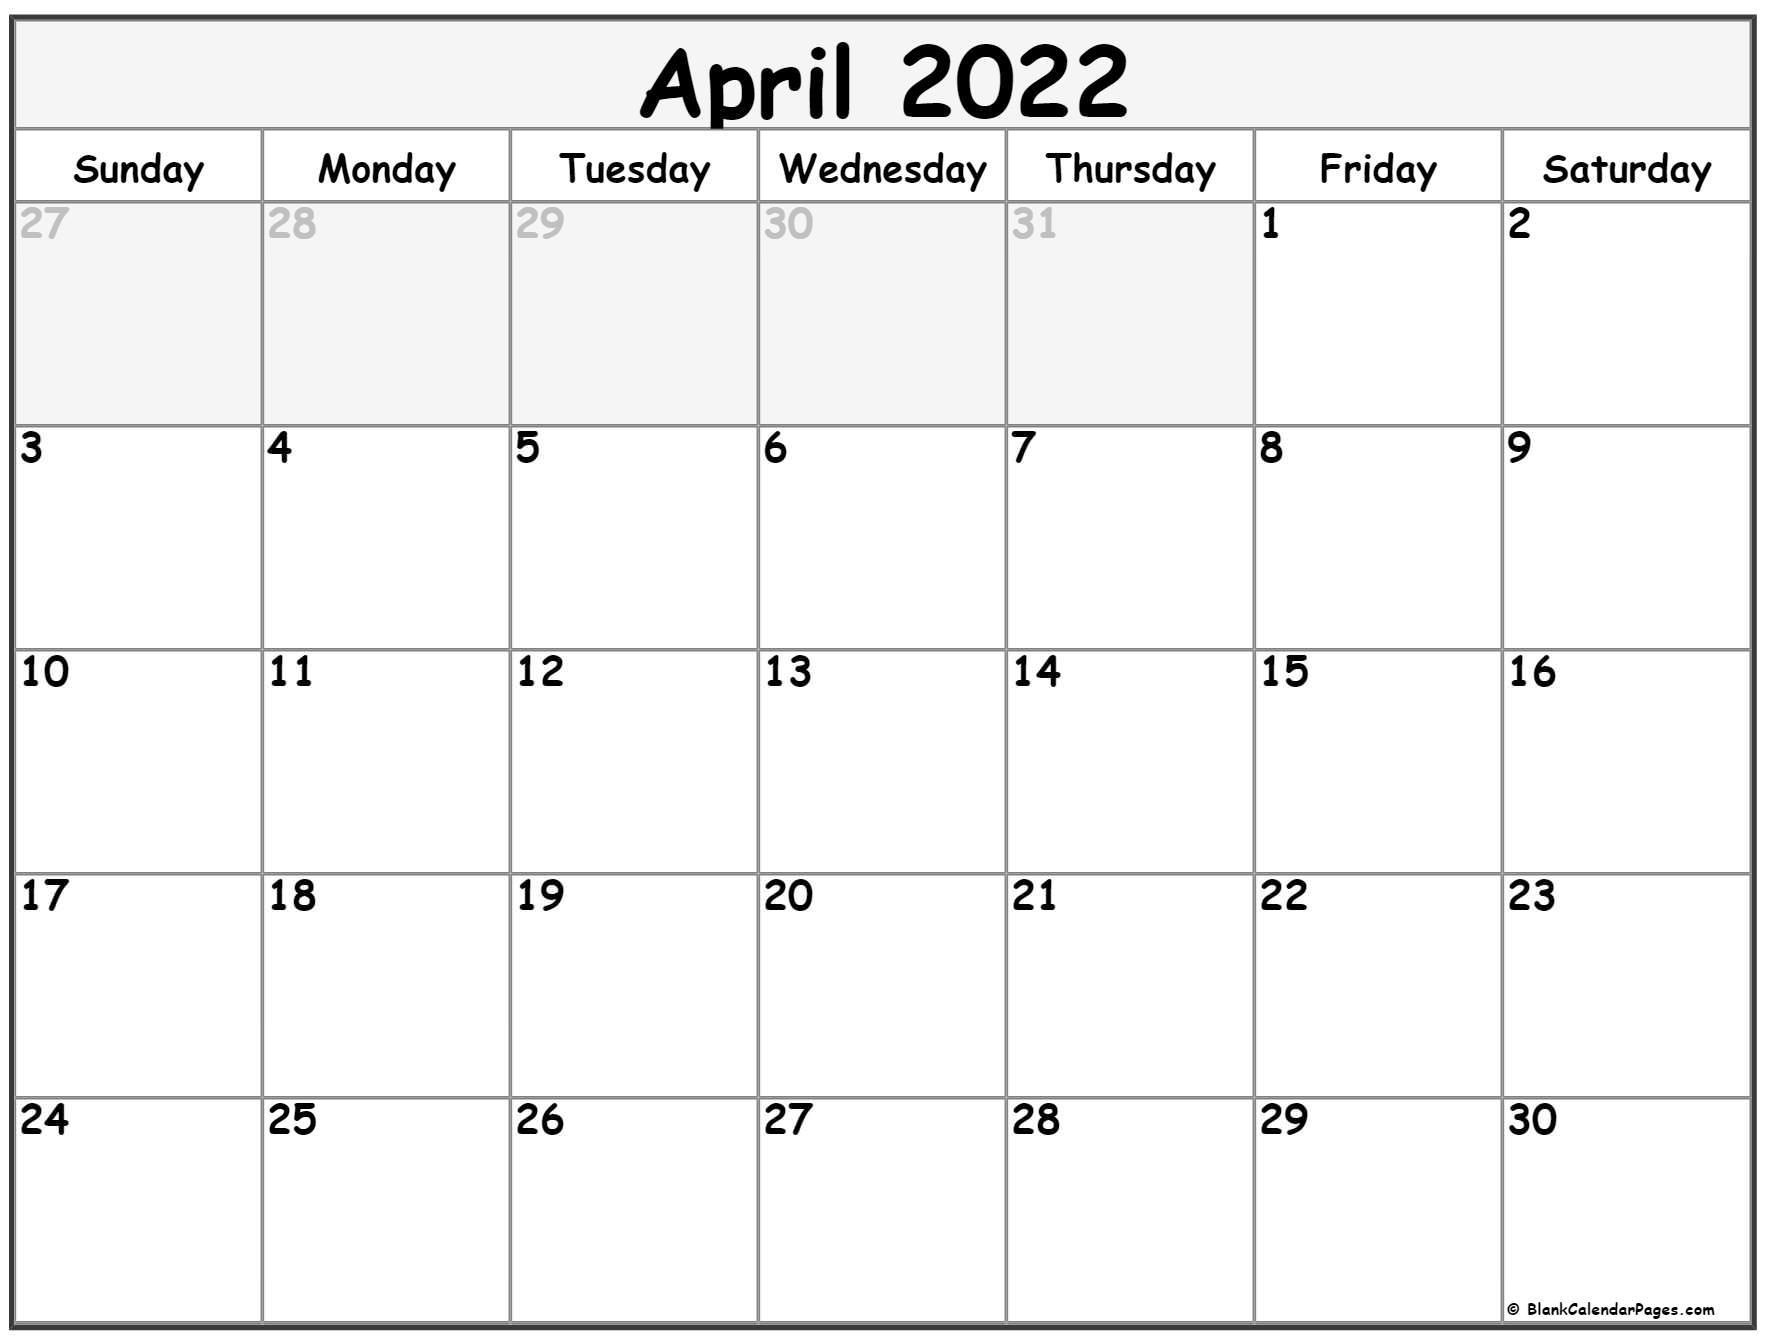 April 2022 Calendar | Free Printable Calendar Templates Inside Calendars March April And May 2022 Calendar